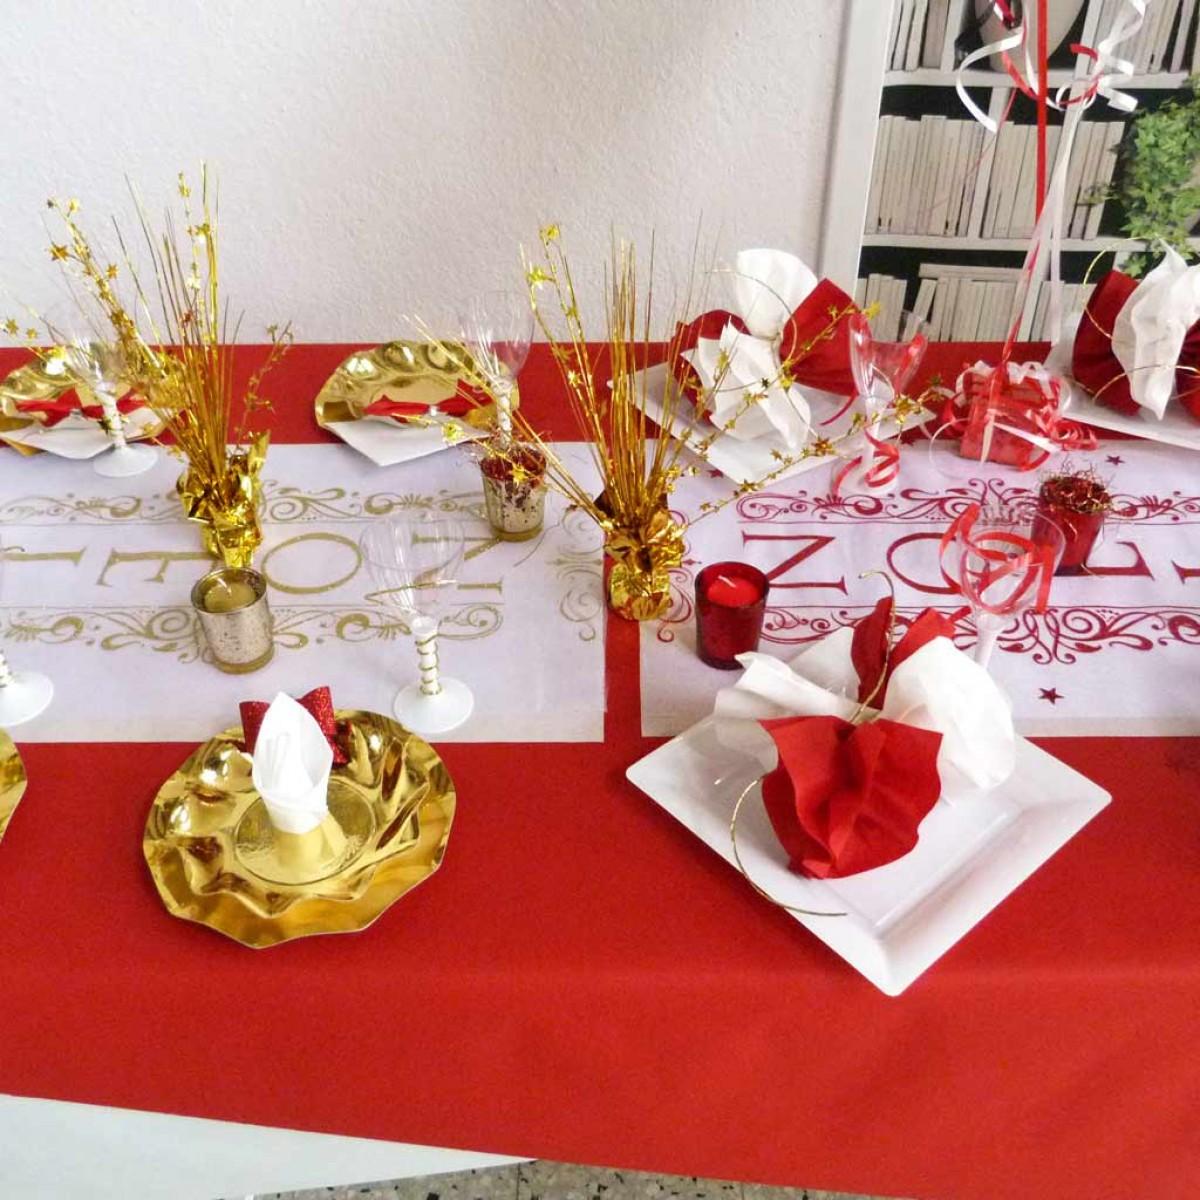 Deco mariage rouge blanc or le mariage - Decoration mariage rouge et blanc ...